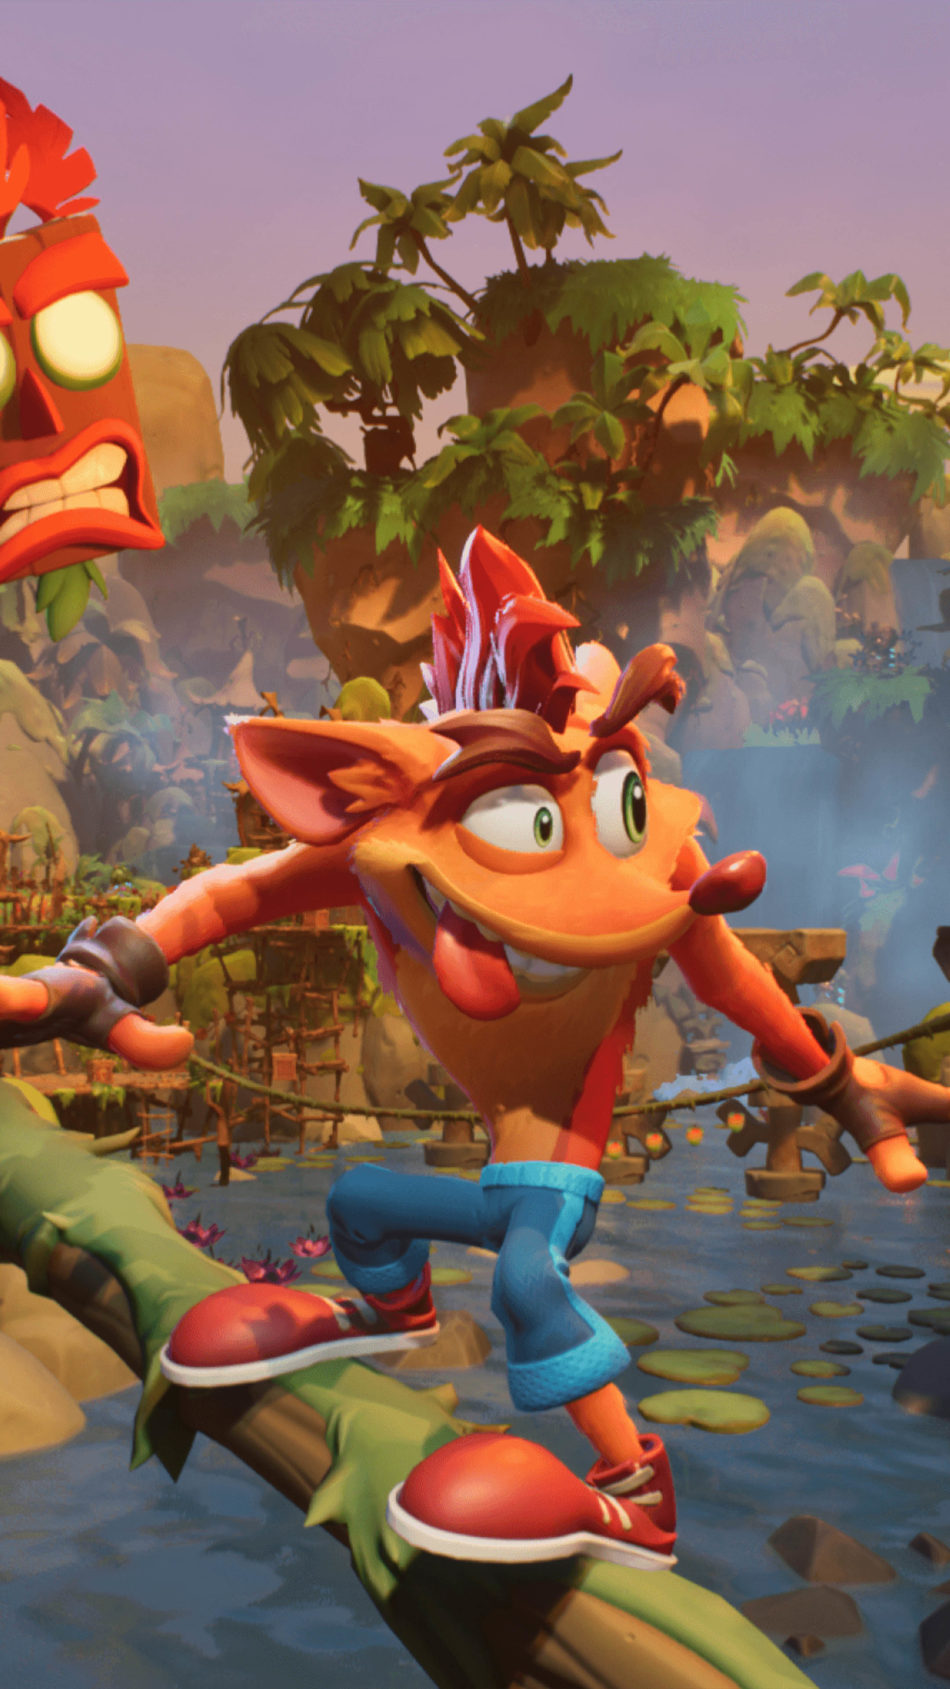 Crash Bandicoot 4 It's About Time Jungle 4K Ultra HD Mobile Wallpaper